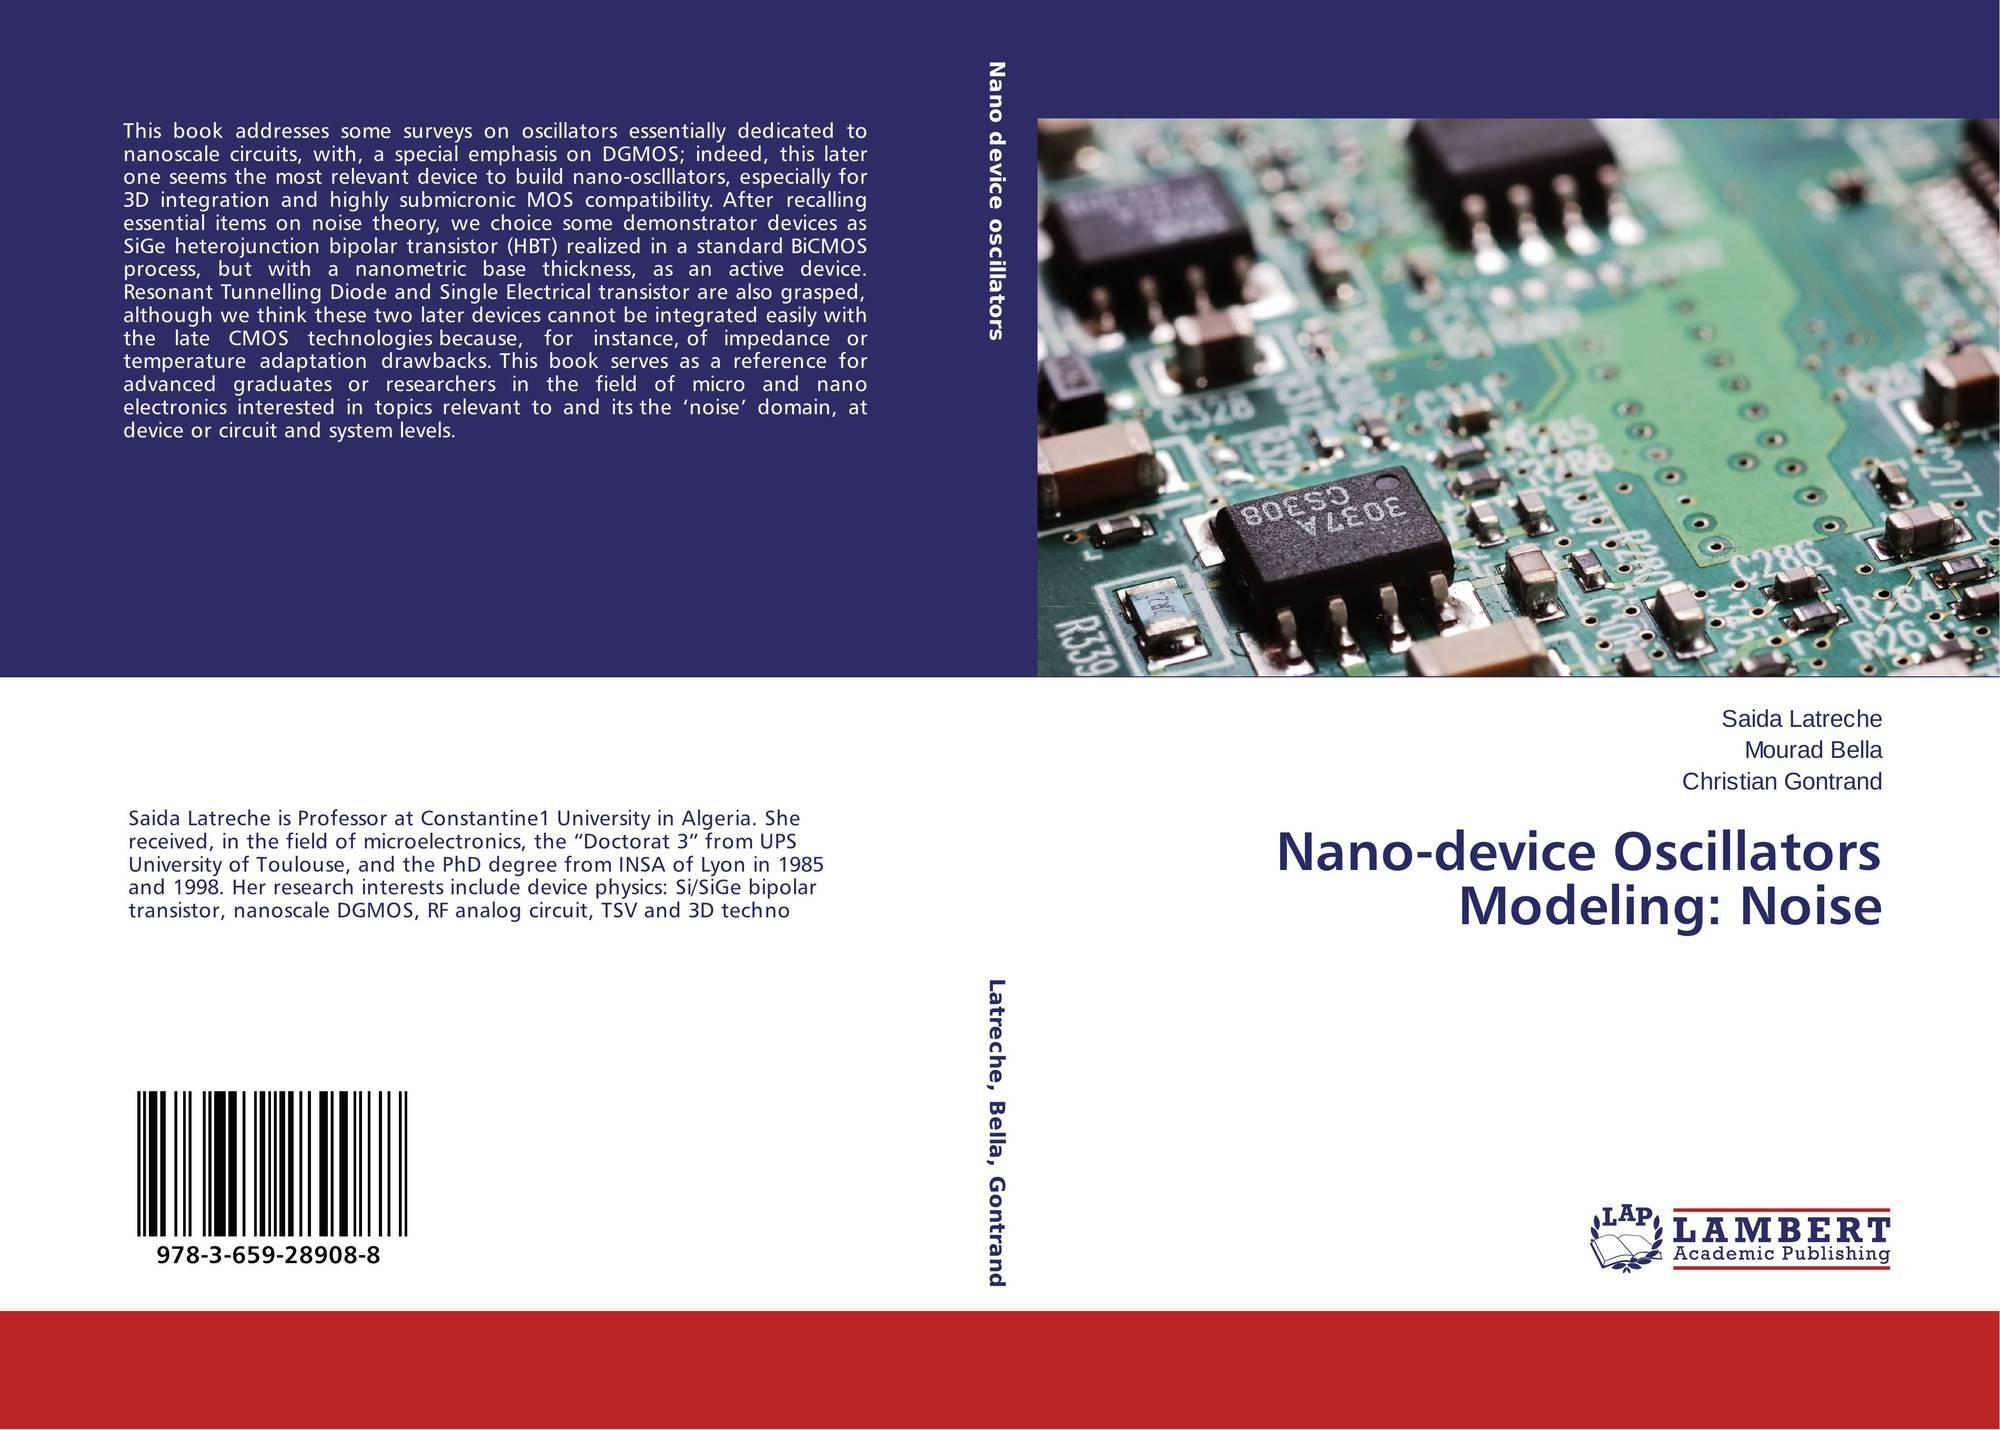 Nano Device Oscillators Modeling Noise 978 3 659 28908 8 Transistor 9783659289088